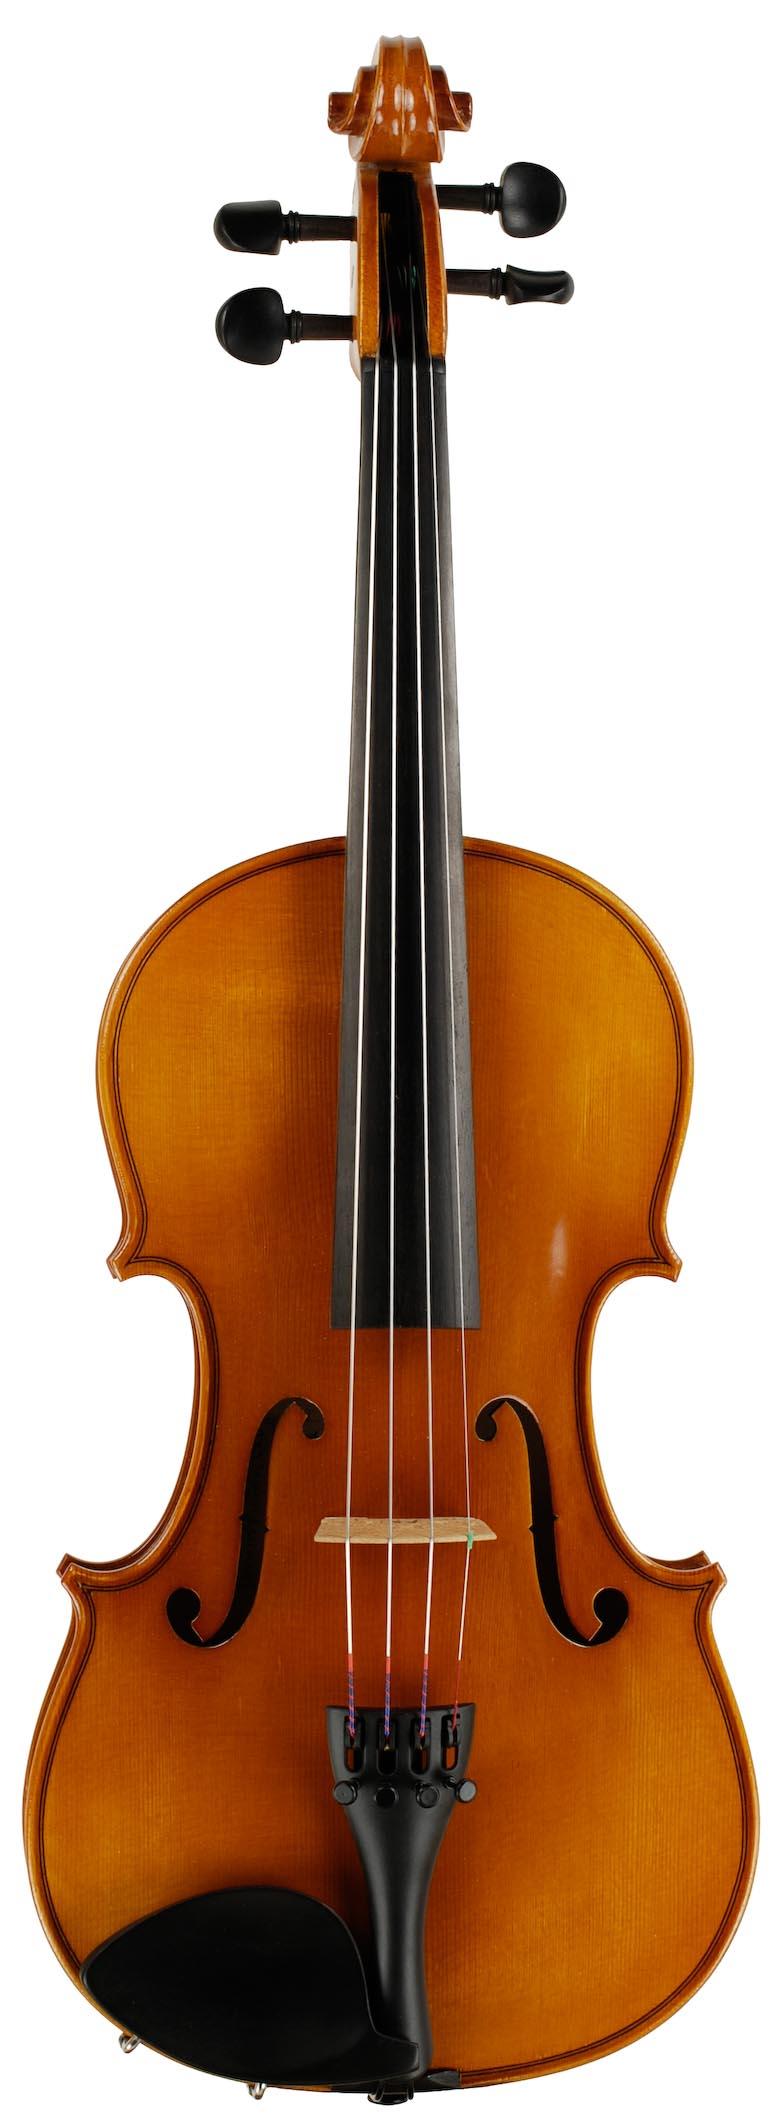 Standard Violin Rental J R Judd Violins